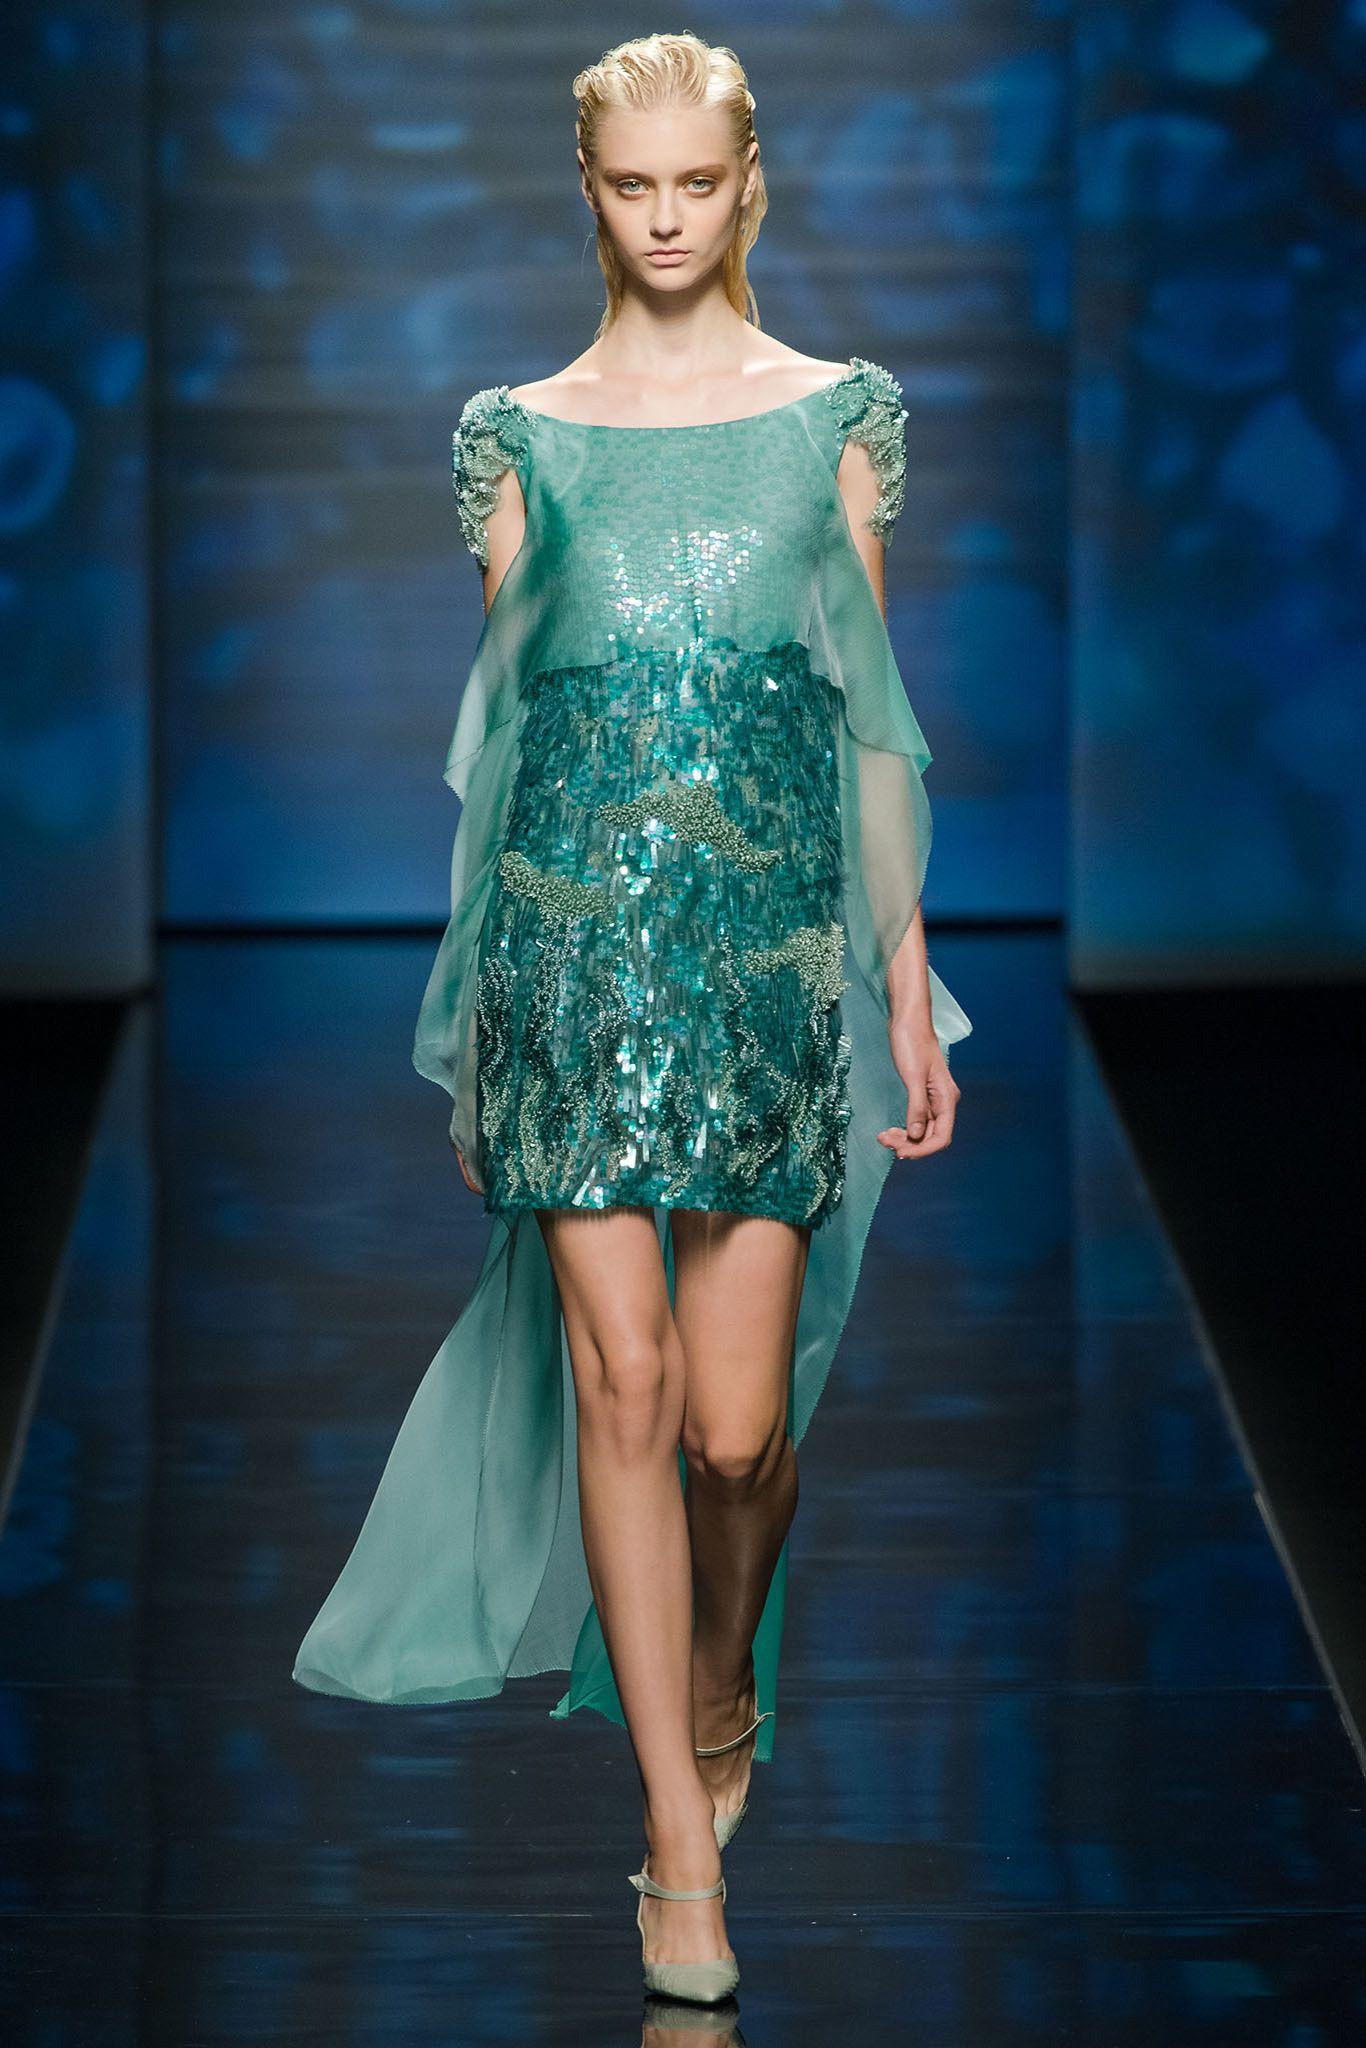 Alberta Ferretti Spring 2013 Ready-to-Wear Fashion Show - Nastya Kusakina